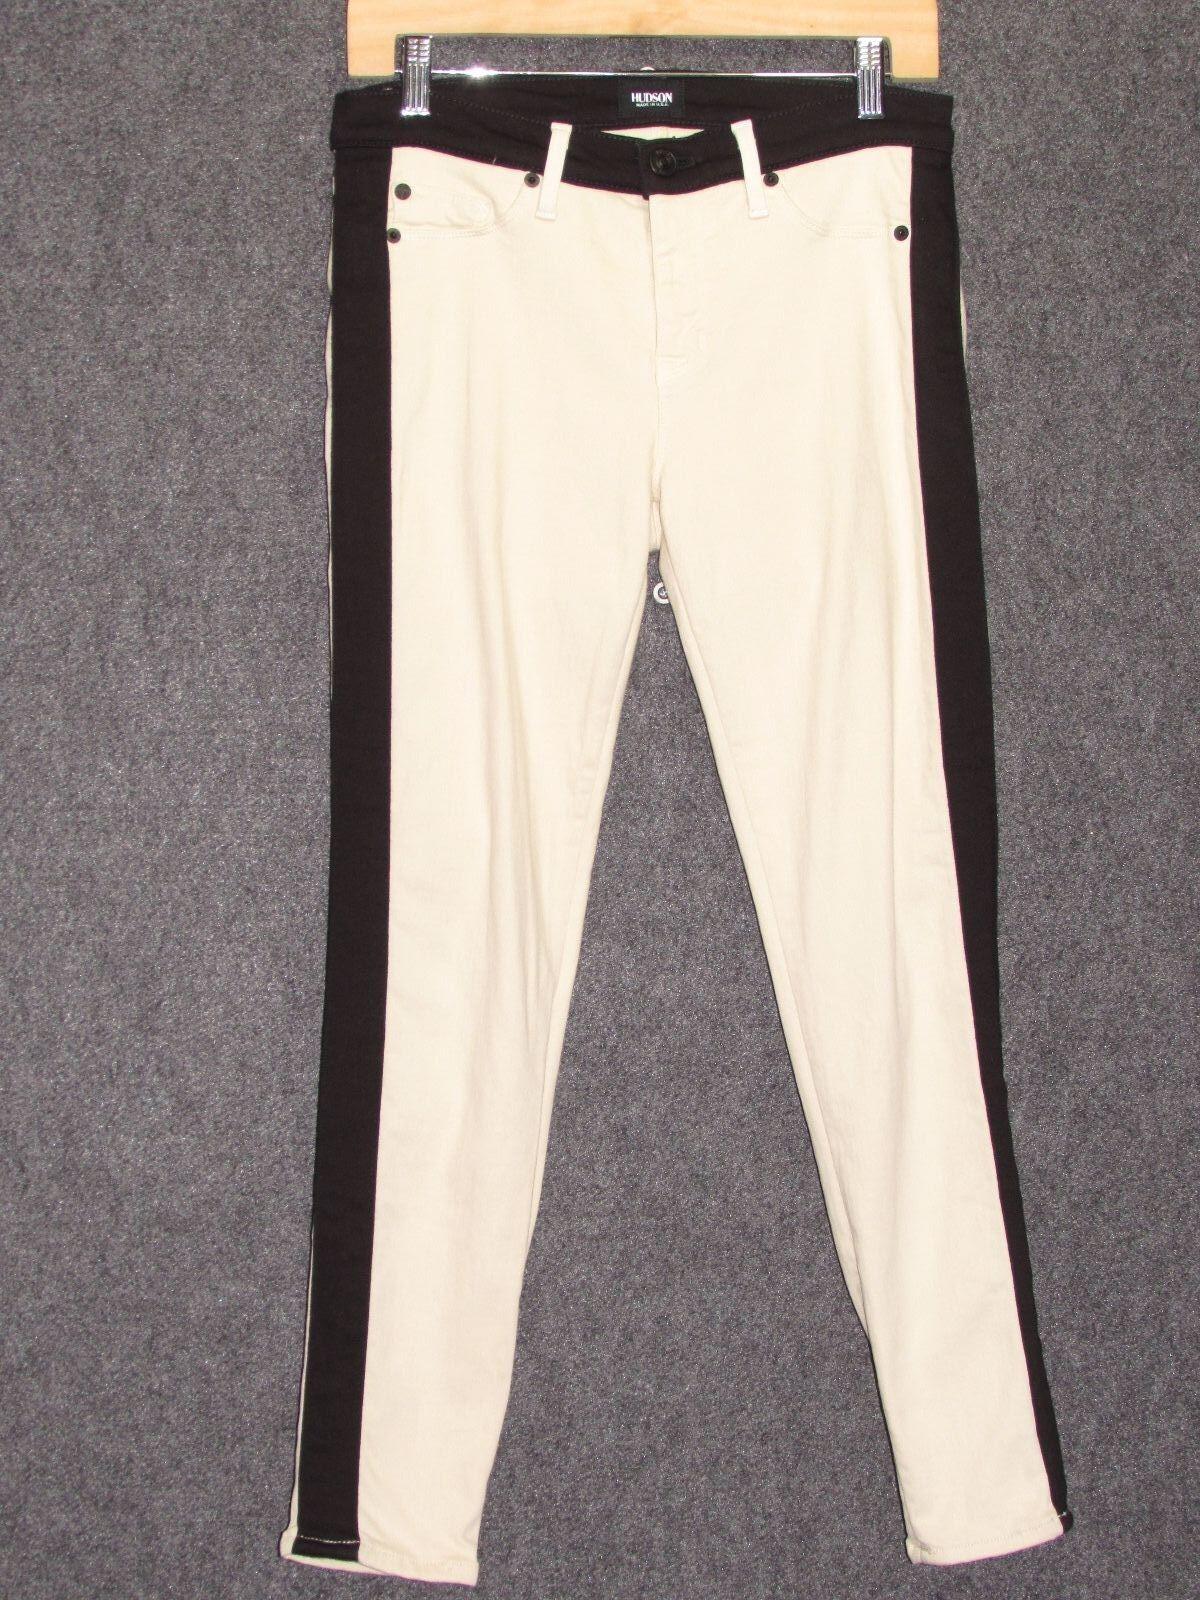 HUDSON JEANS Leeloo Super Bone Skinny Ankle Crop Jeans SZ 29